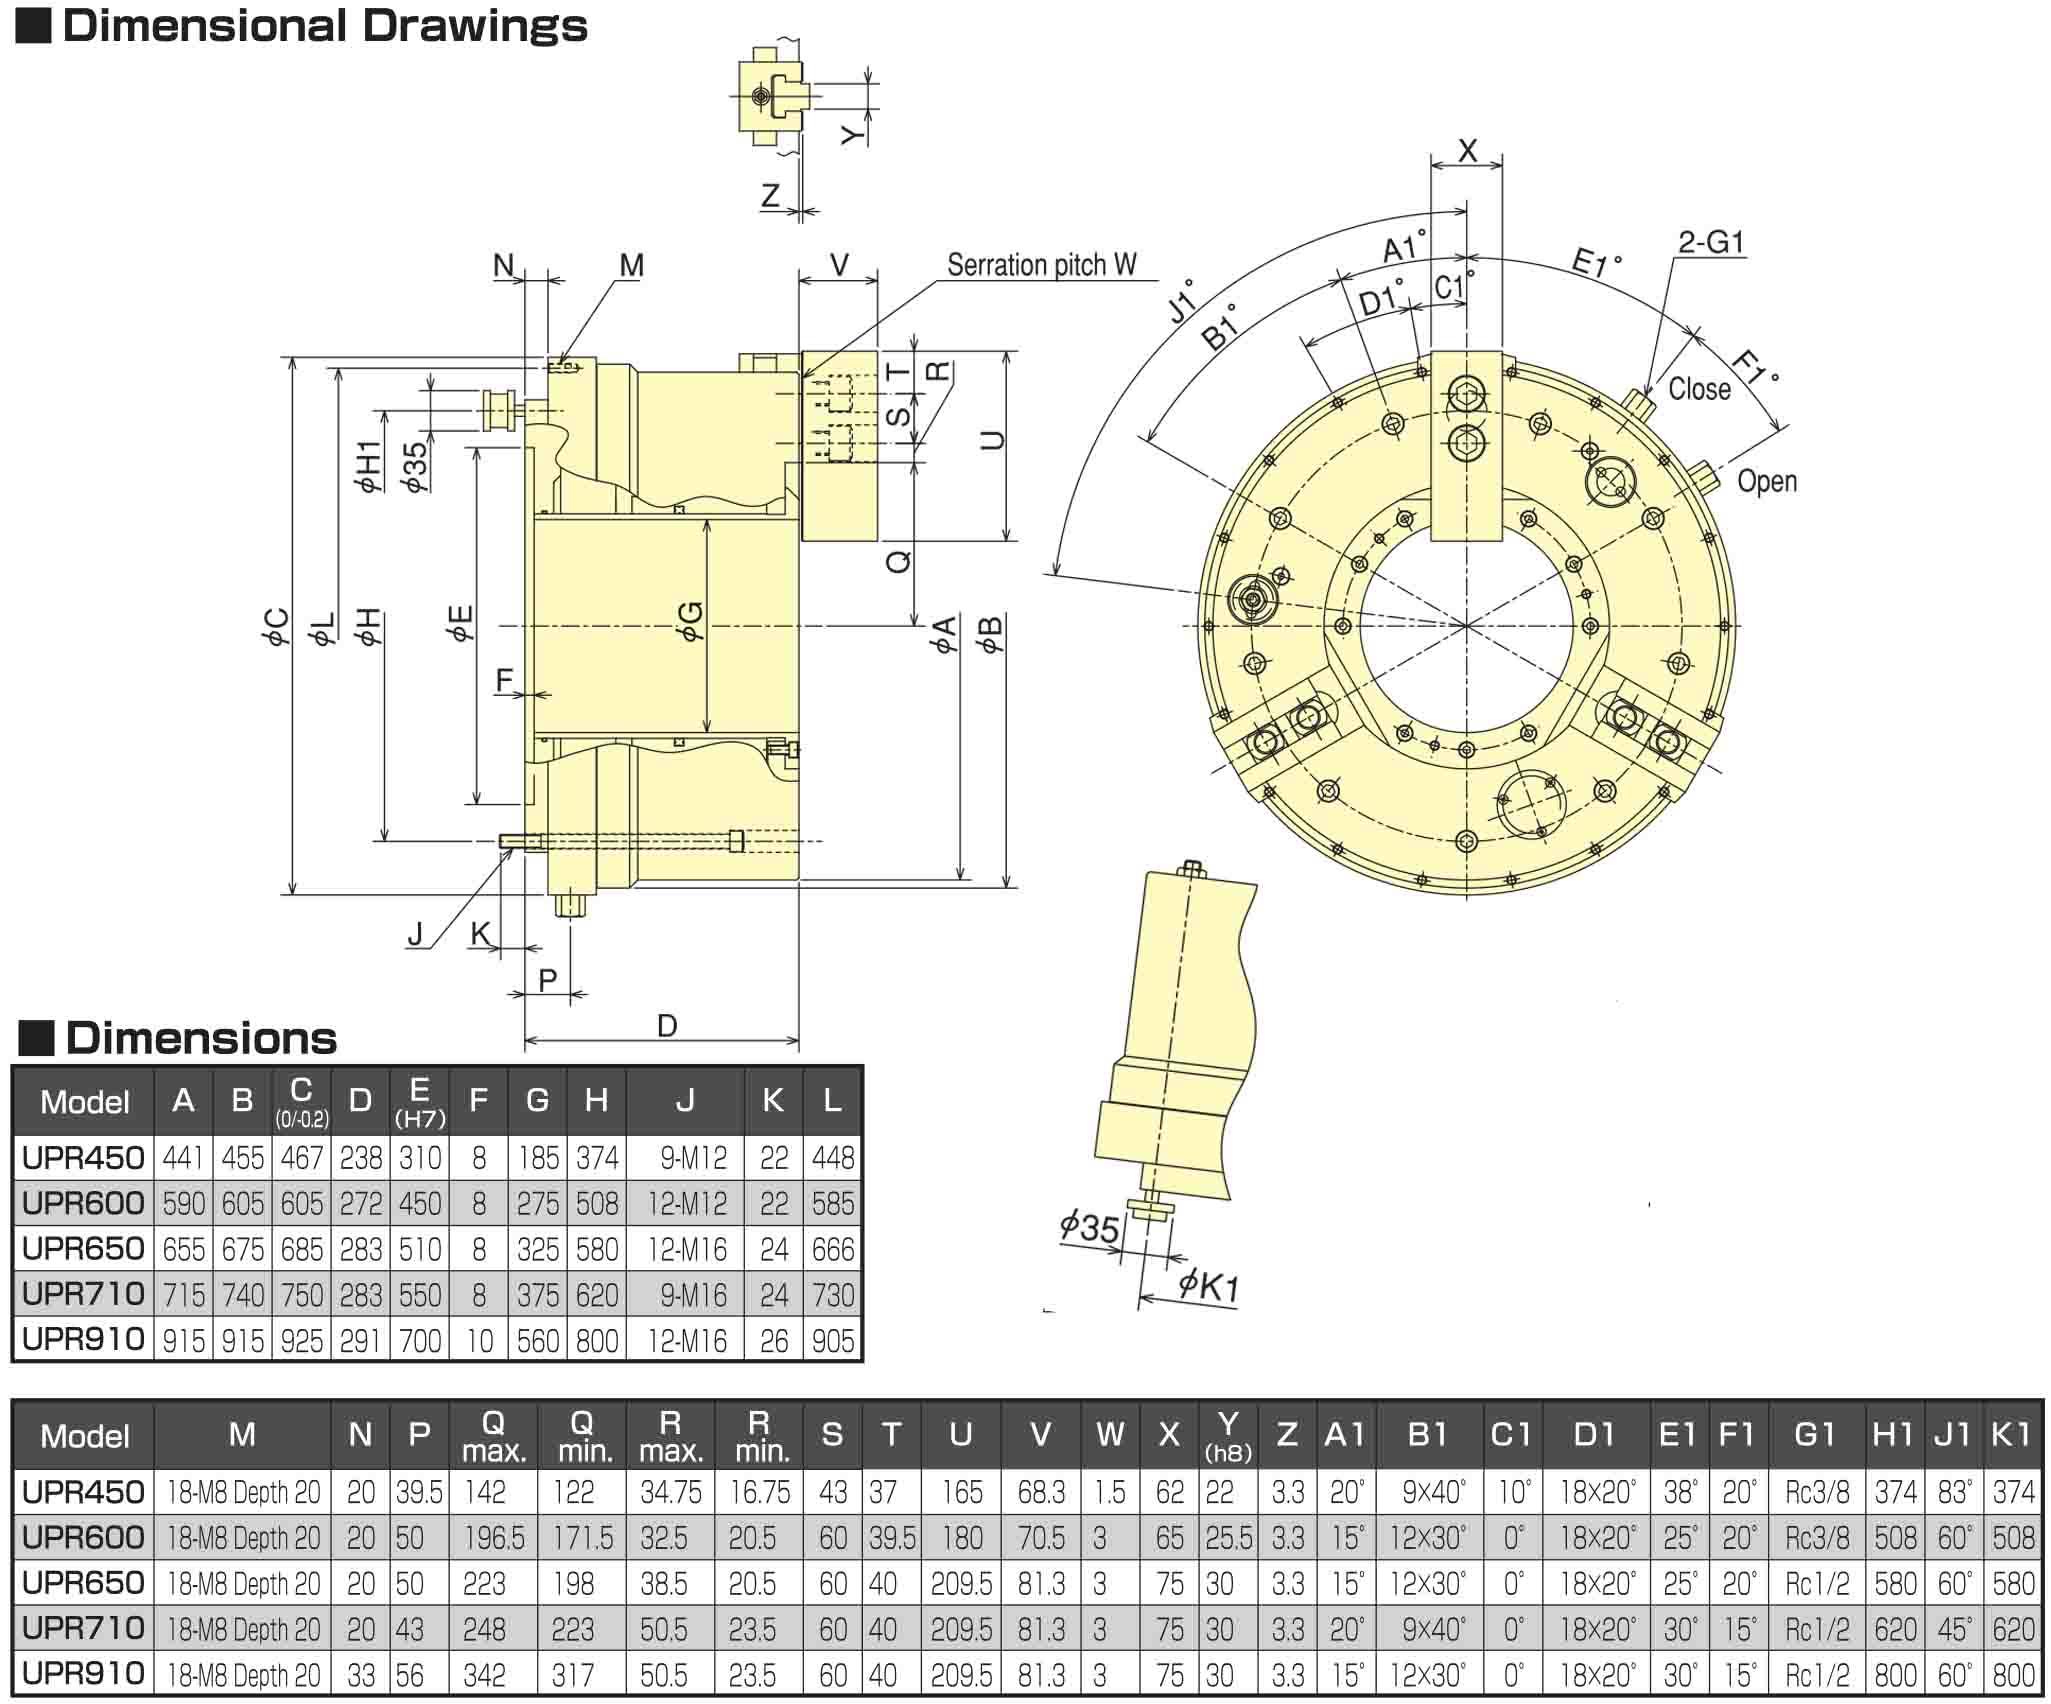 Kitagawa UPR600 Air-Operated Chuck Dimensional Drawings